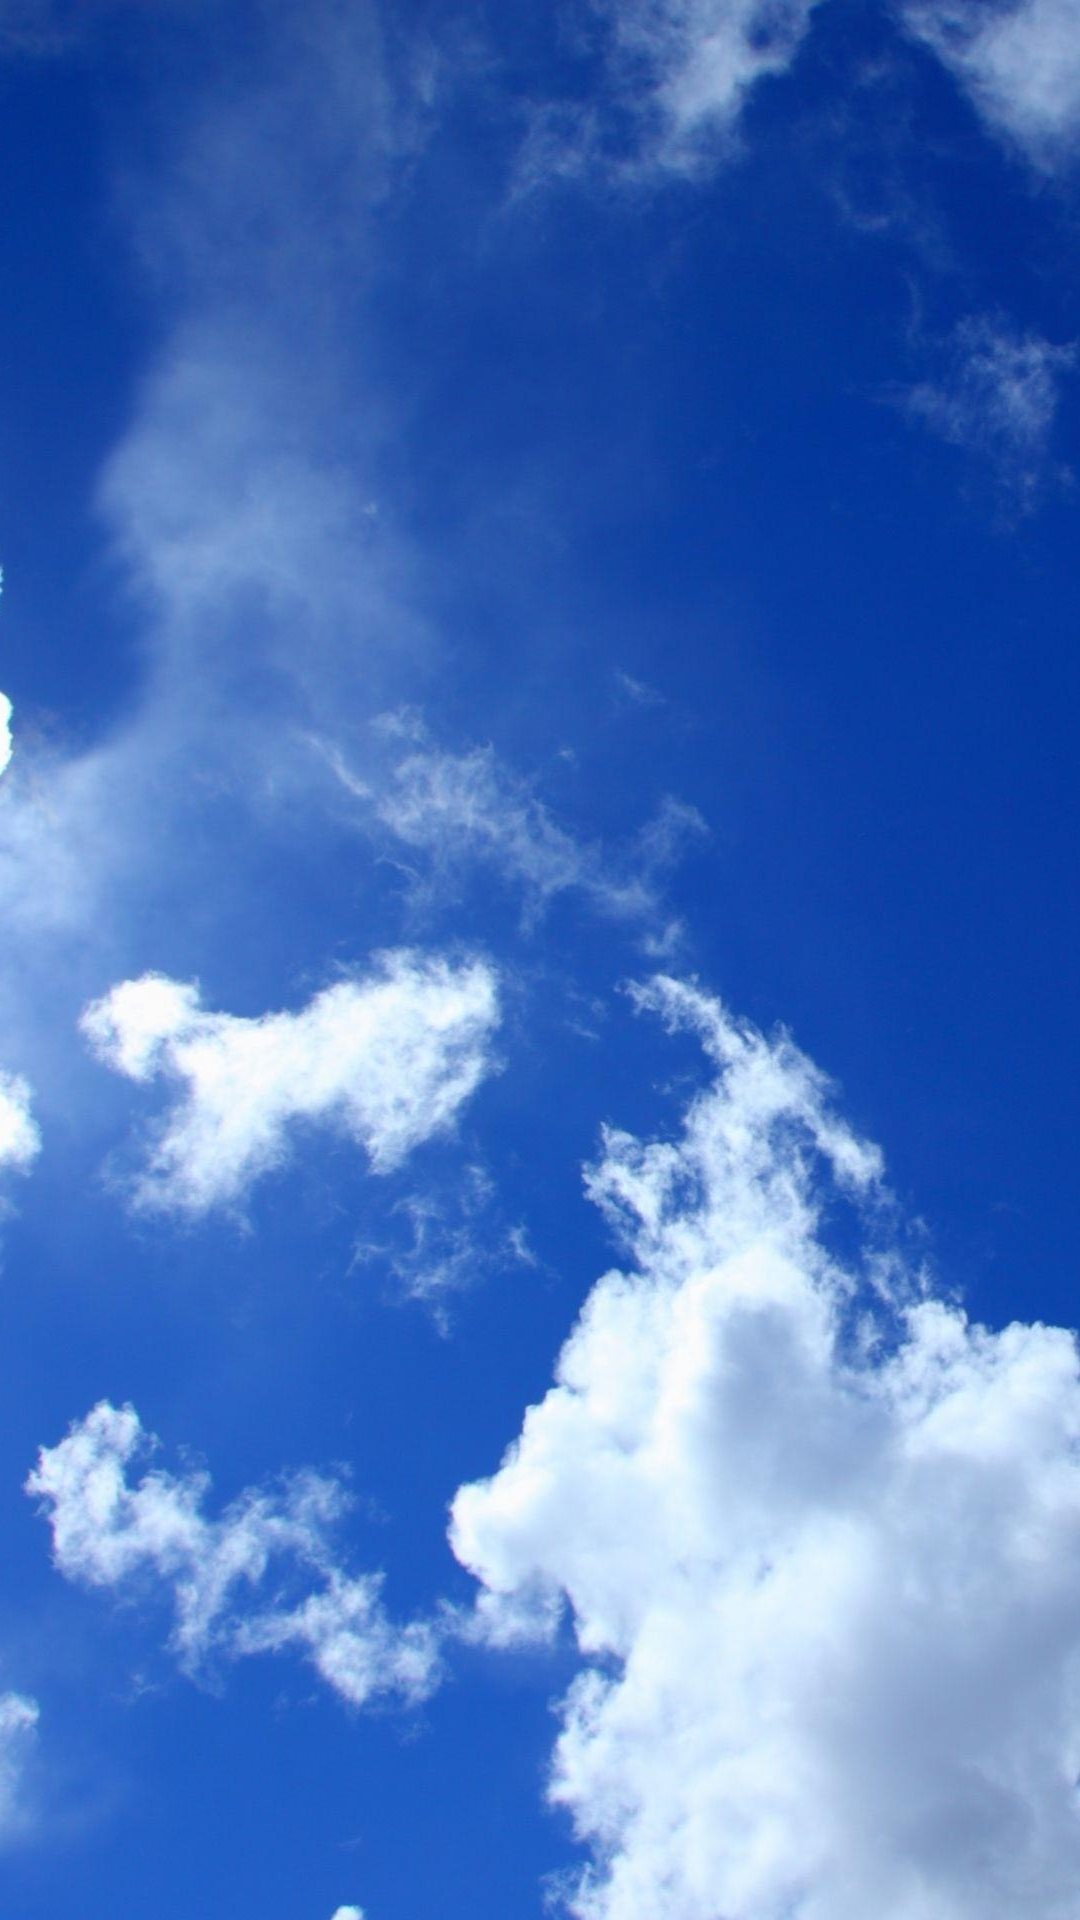 Blue Sky White Clouds Lockscreen iPhone 6 Plus HD Wallpaper …